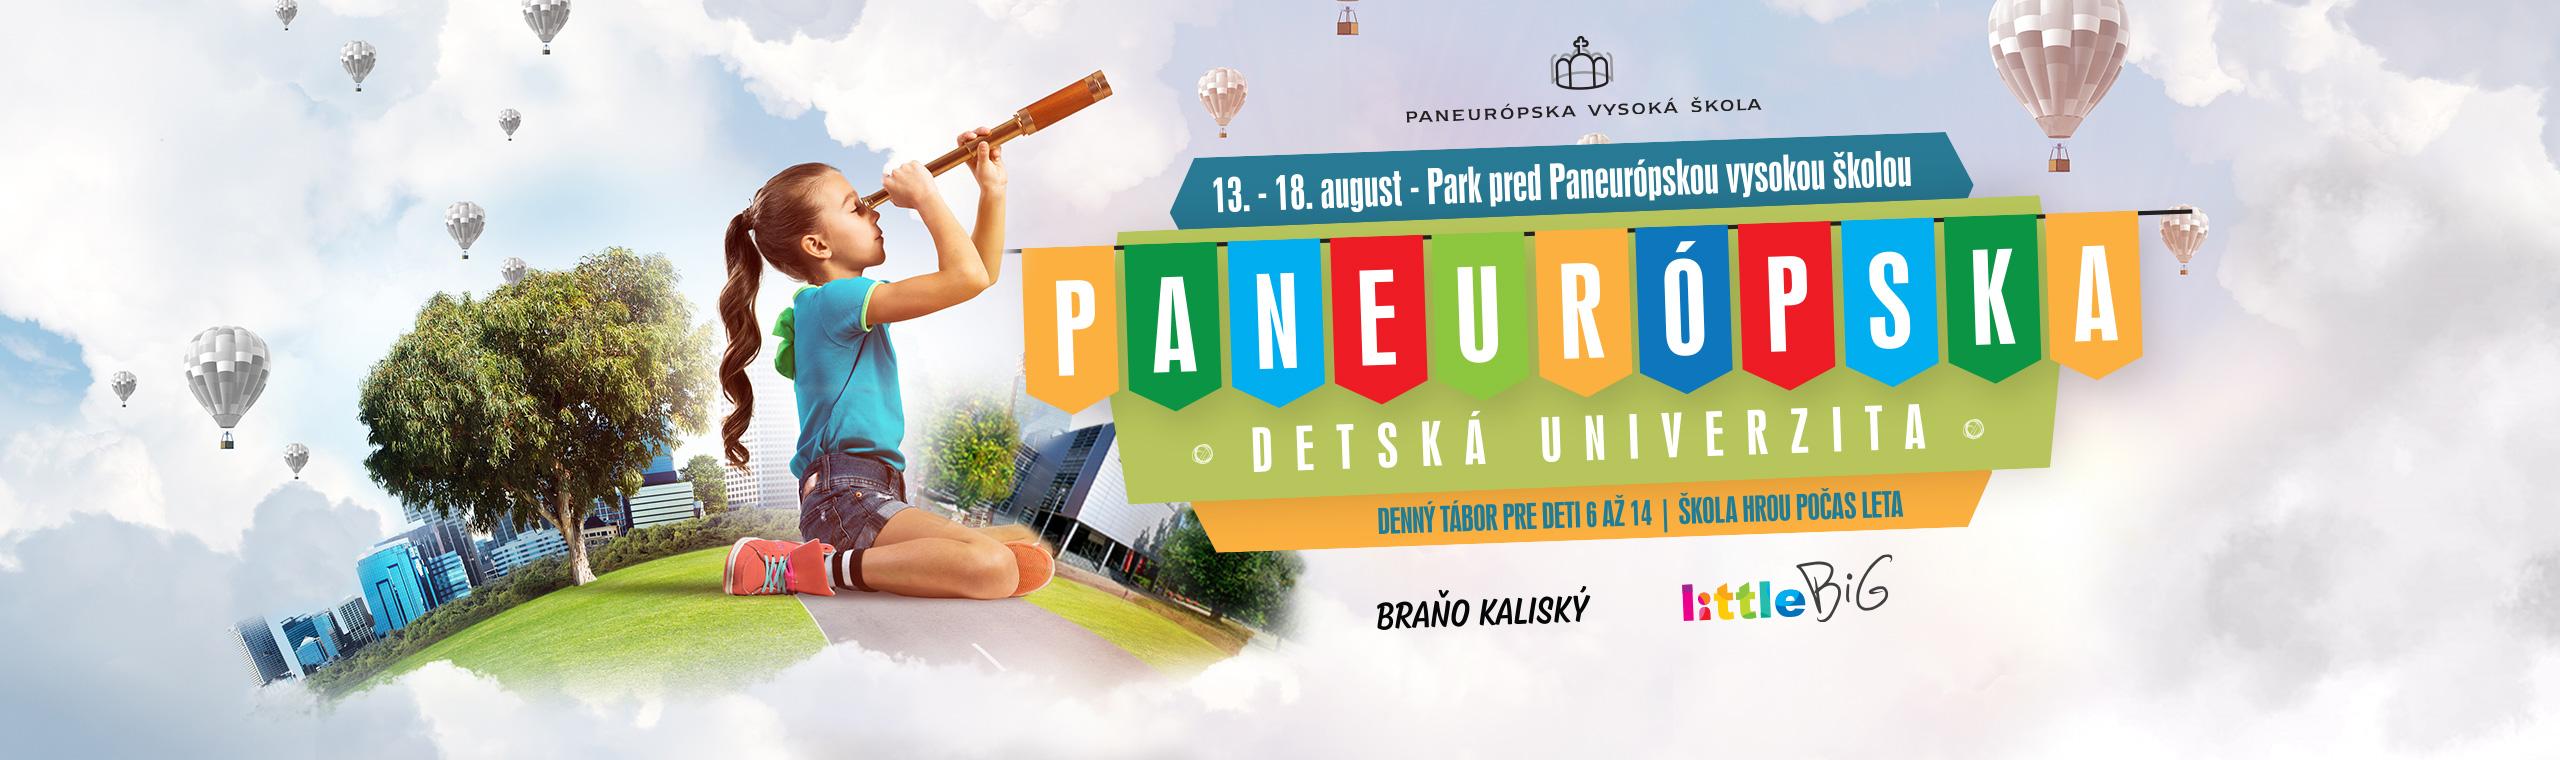 Paneurópska detská univerzita